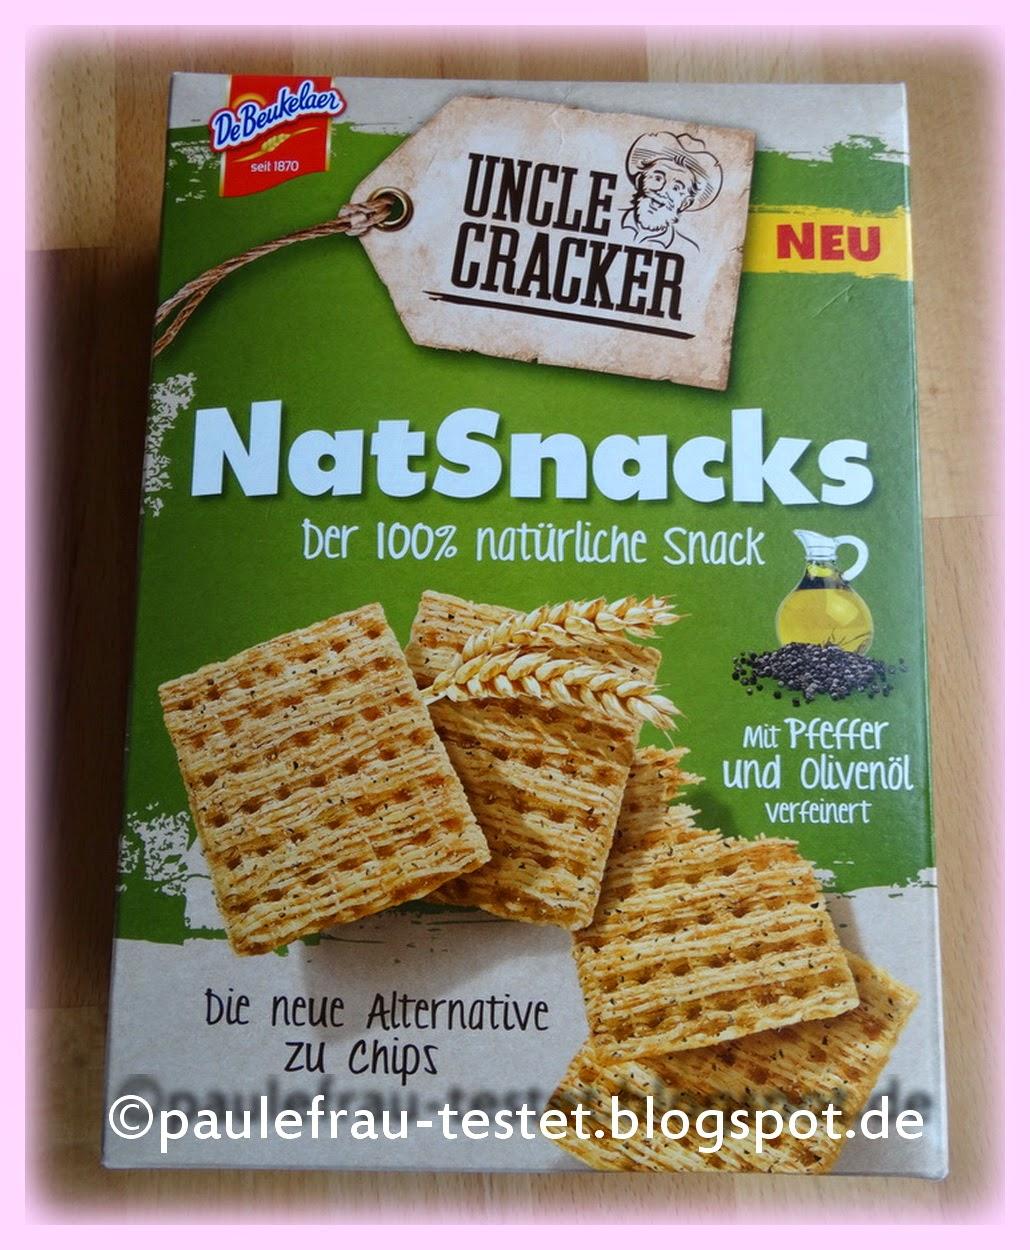 paulefrau s testblog uncle cracker natsnacks die alternative zu chips. Black Bedroom Furniture Sets. Home Design Ideas